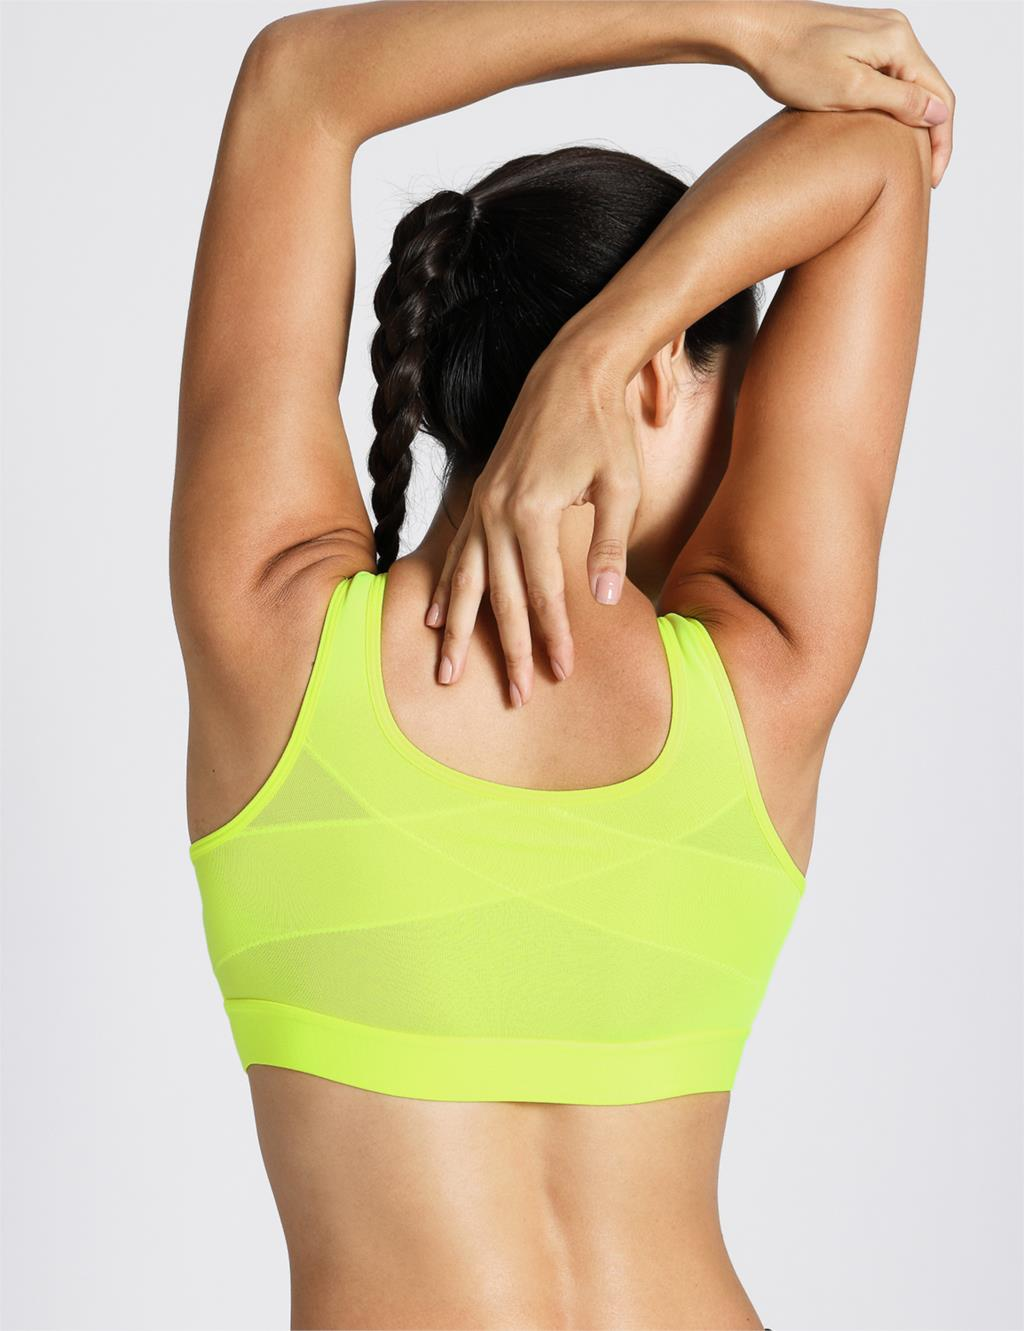 Womens Level 4 Support Non Padded Powerback Underwire Active Bra,Black01,dd,32